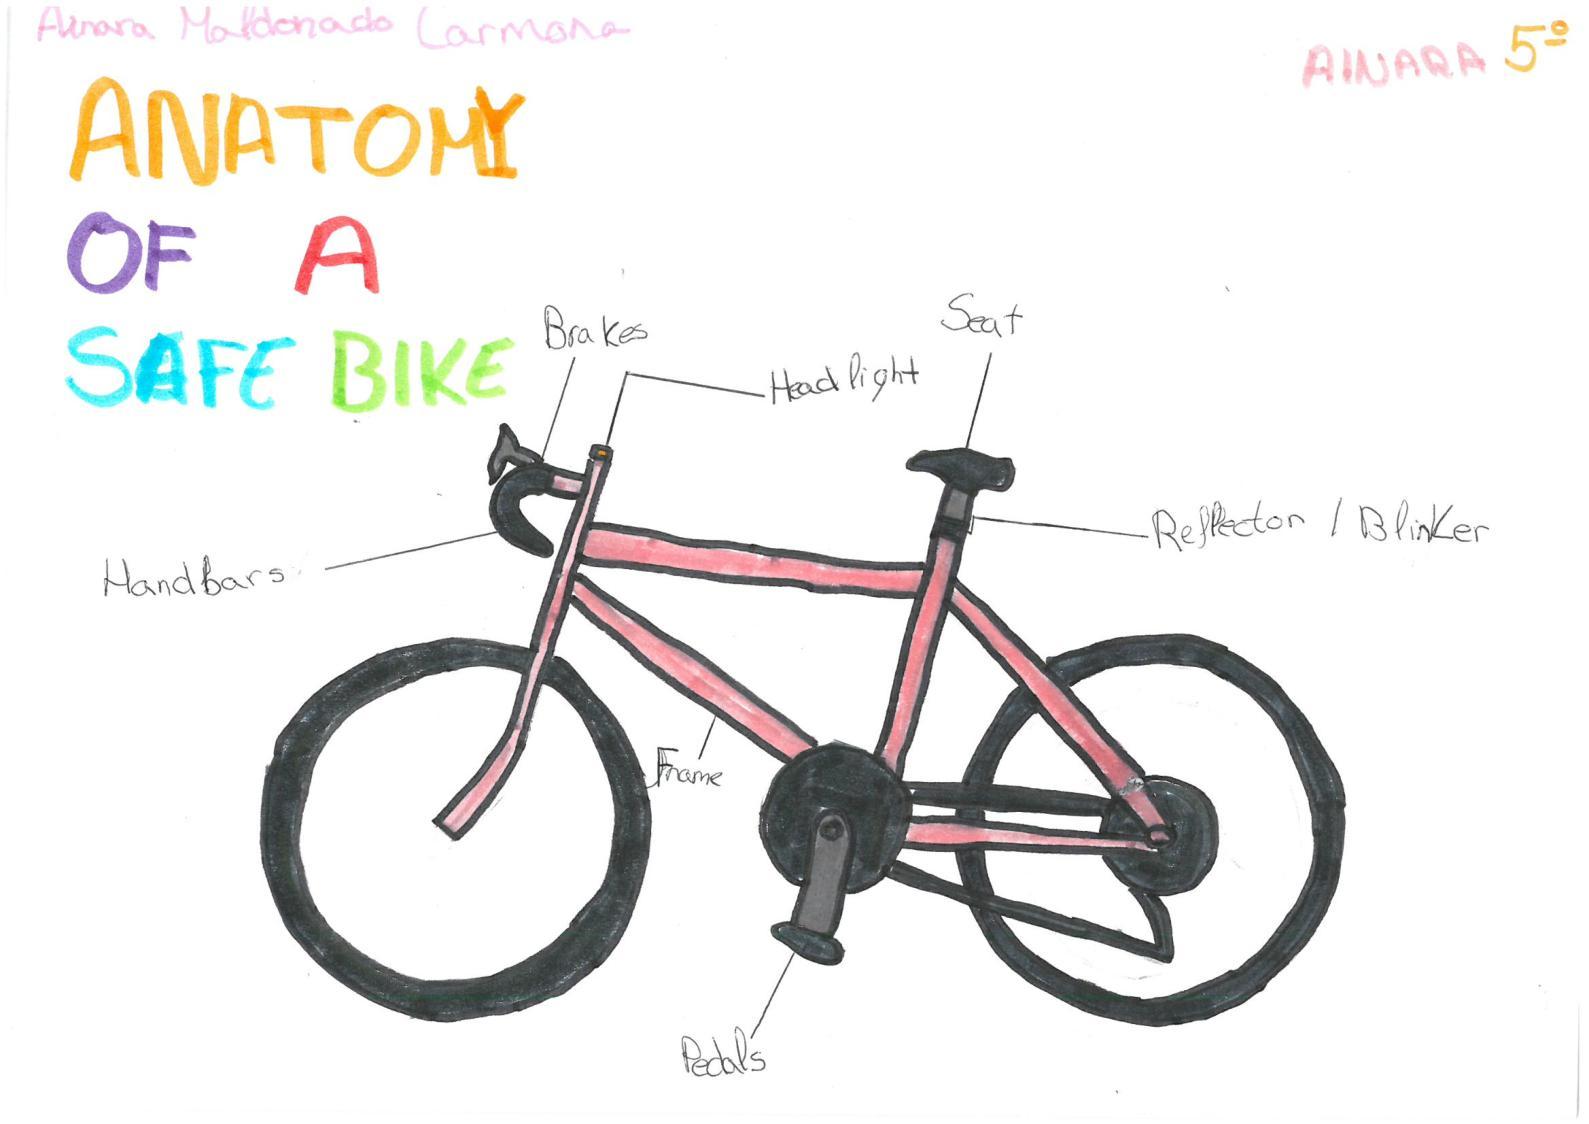 Calamo Anatomy Of A Bike